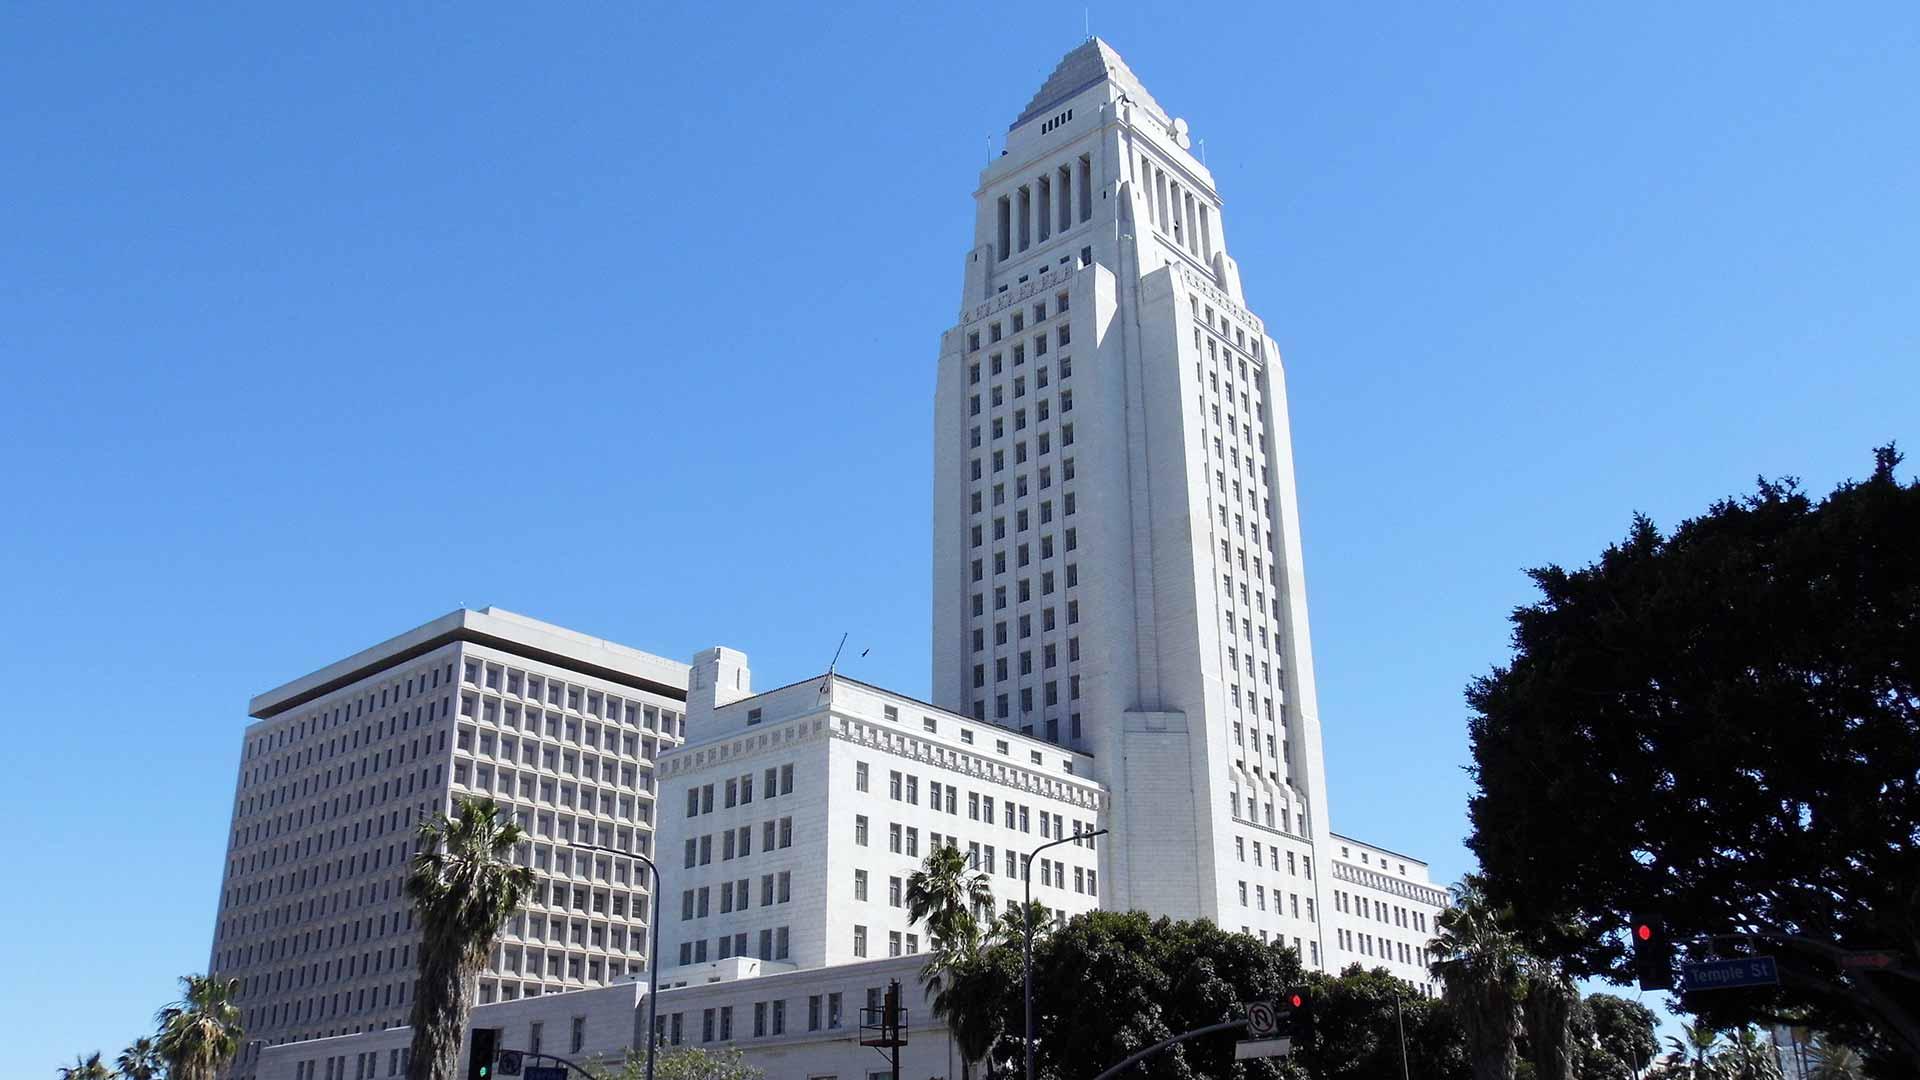 la city hall